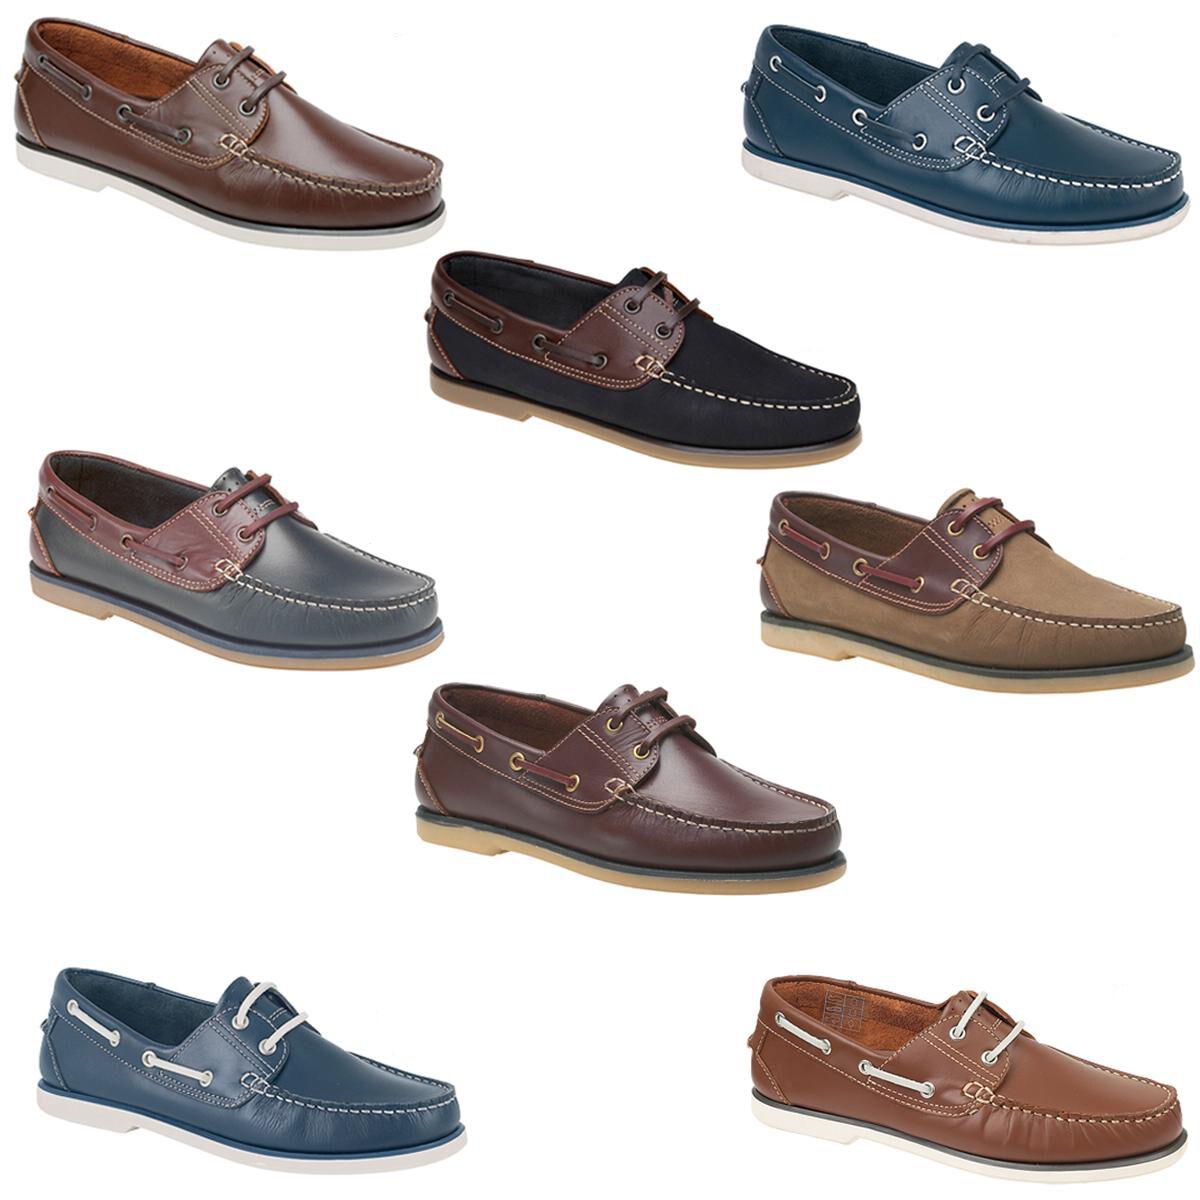 Herren / Gents Leder Boat Deck Leisure Schuhes Comfort Größe 6 7 8 9 10 11 12